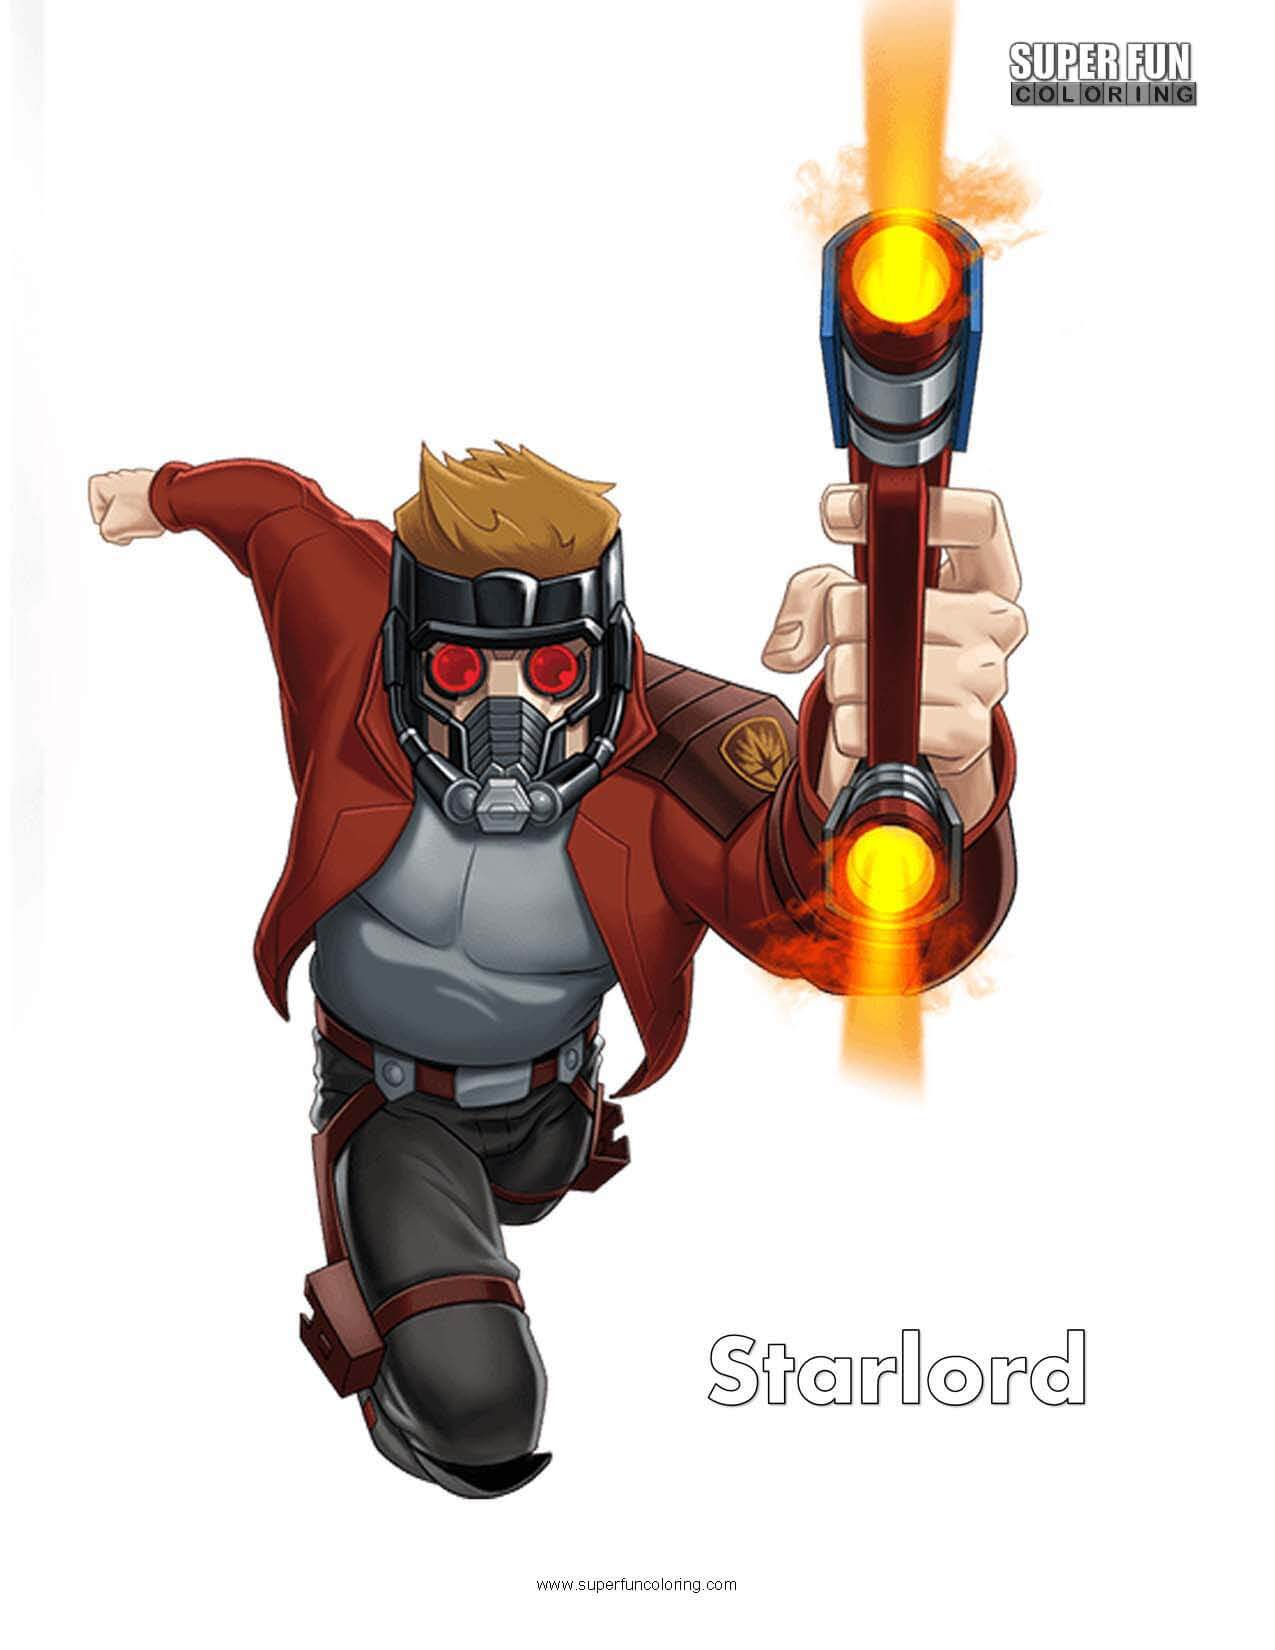 Starlord Free Superhero Coloring Page